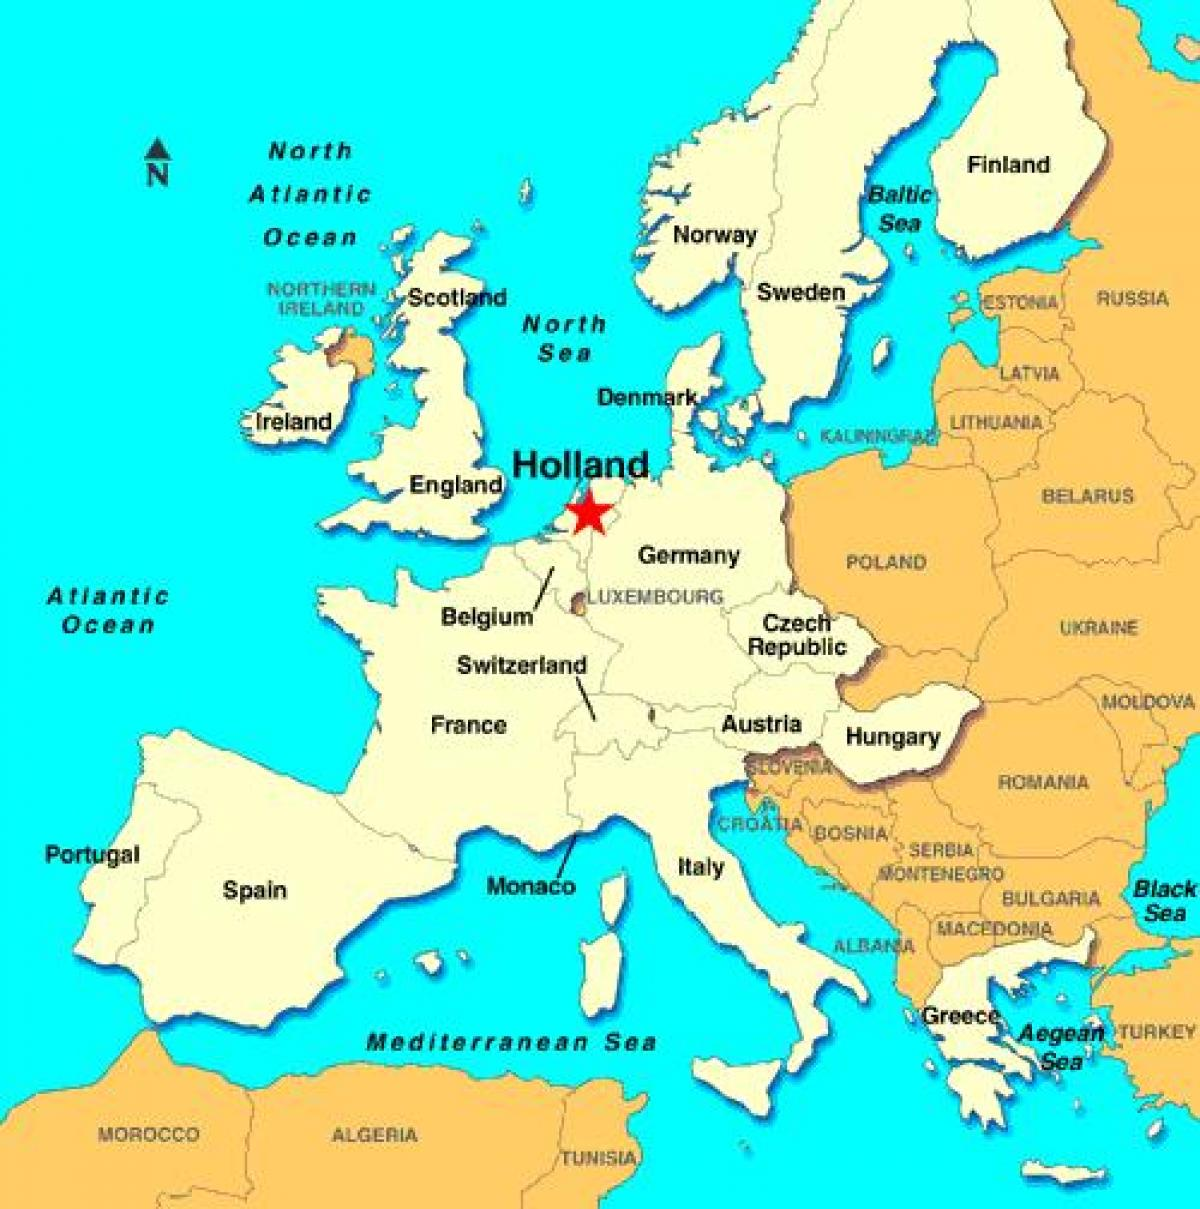 mapa europa holanda Holanda mapa europa   Mapa europan Holanda (Mendebaldeko Europa  mapa europa holanda